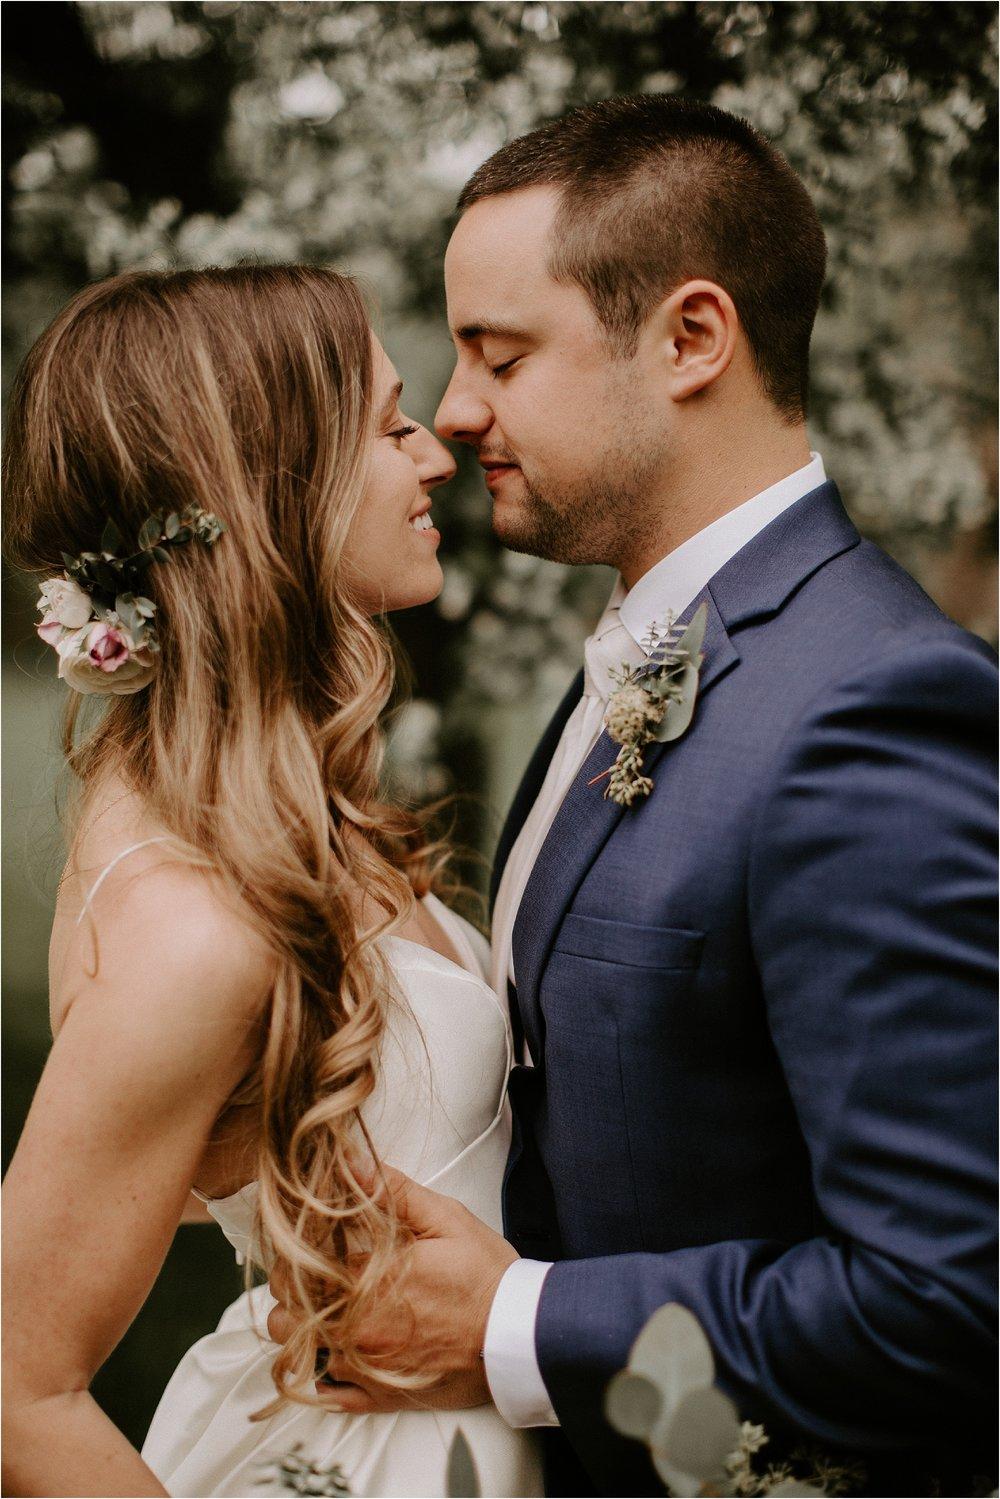 Sarah_Brookhart_Lancaster_PA_Wedding_Photographer_0026.jpg